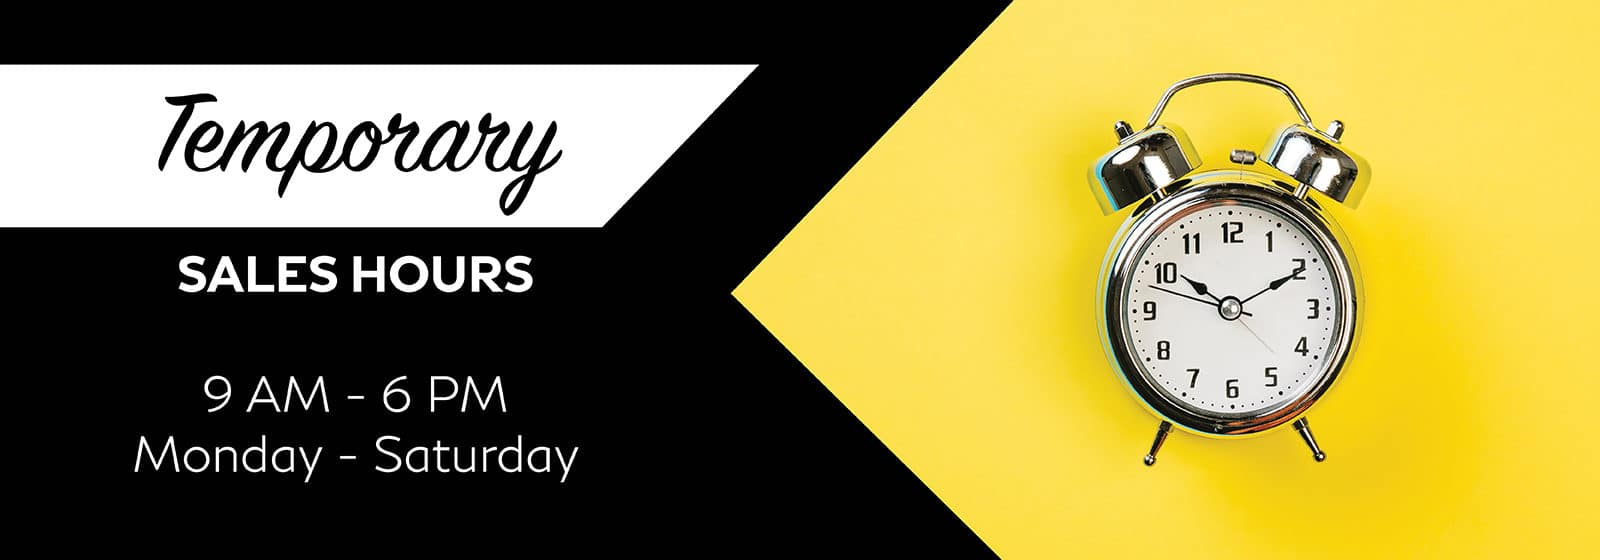 temporary sales hours per COVID-19 9 am - 6 pm monday - saturday